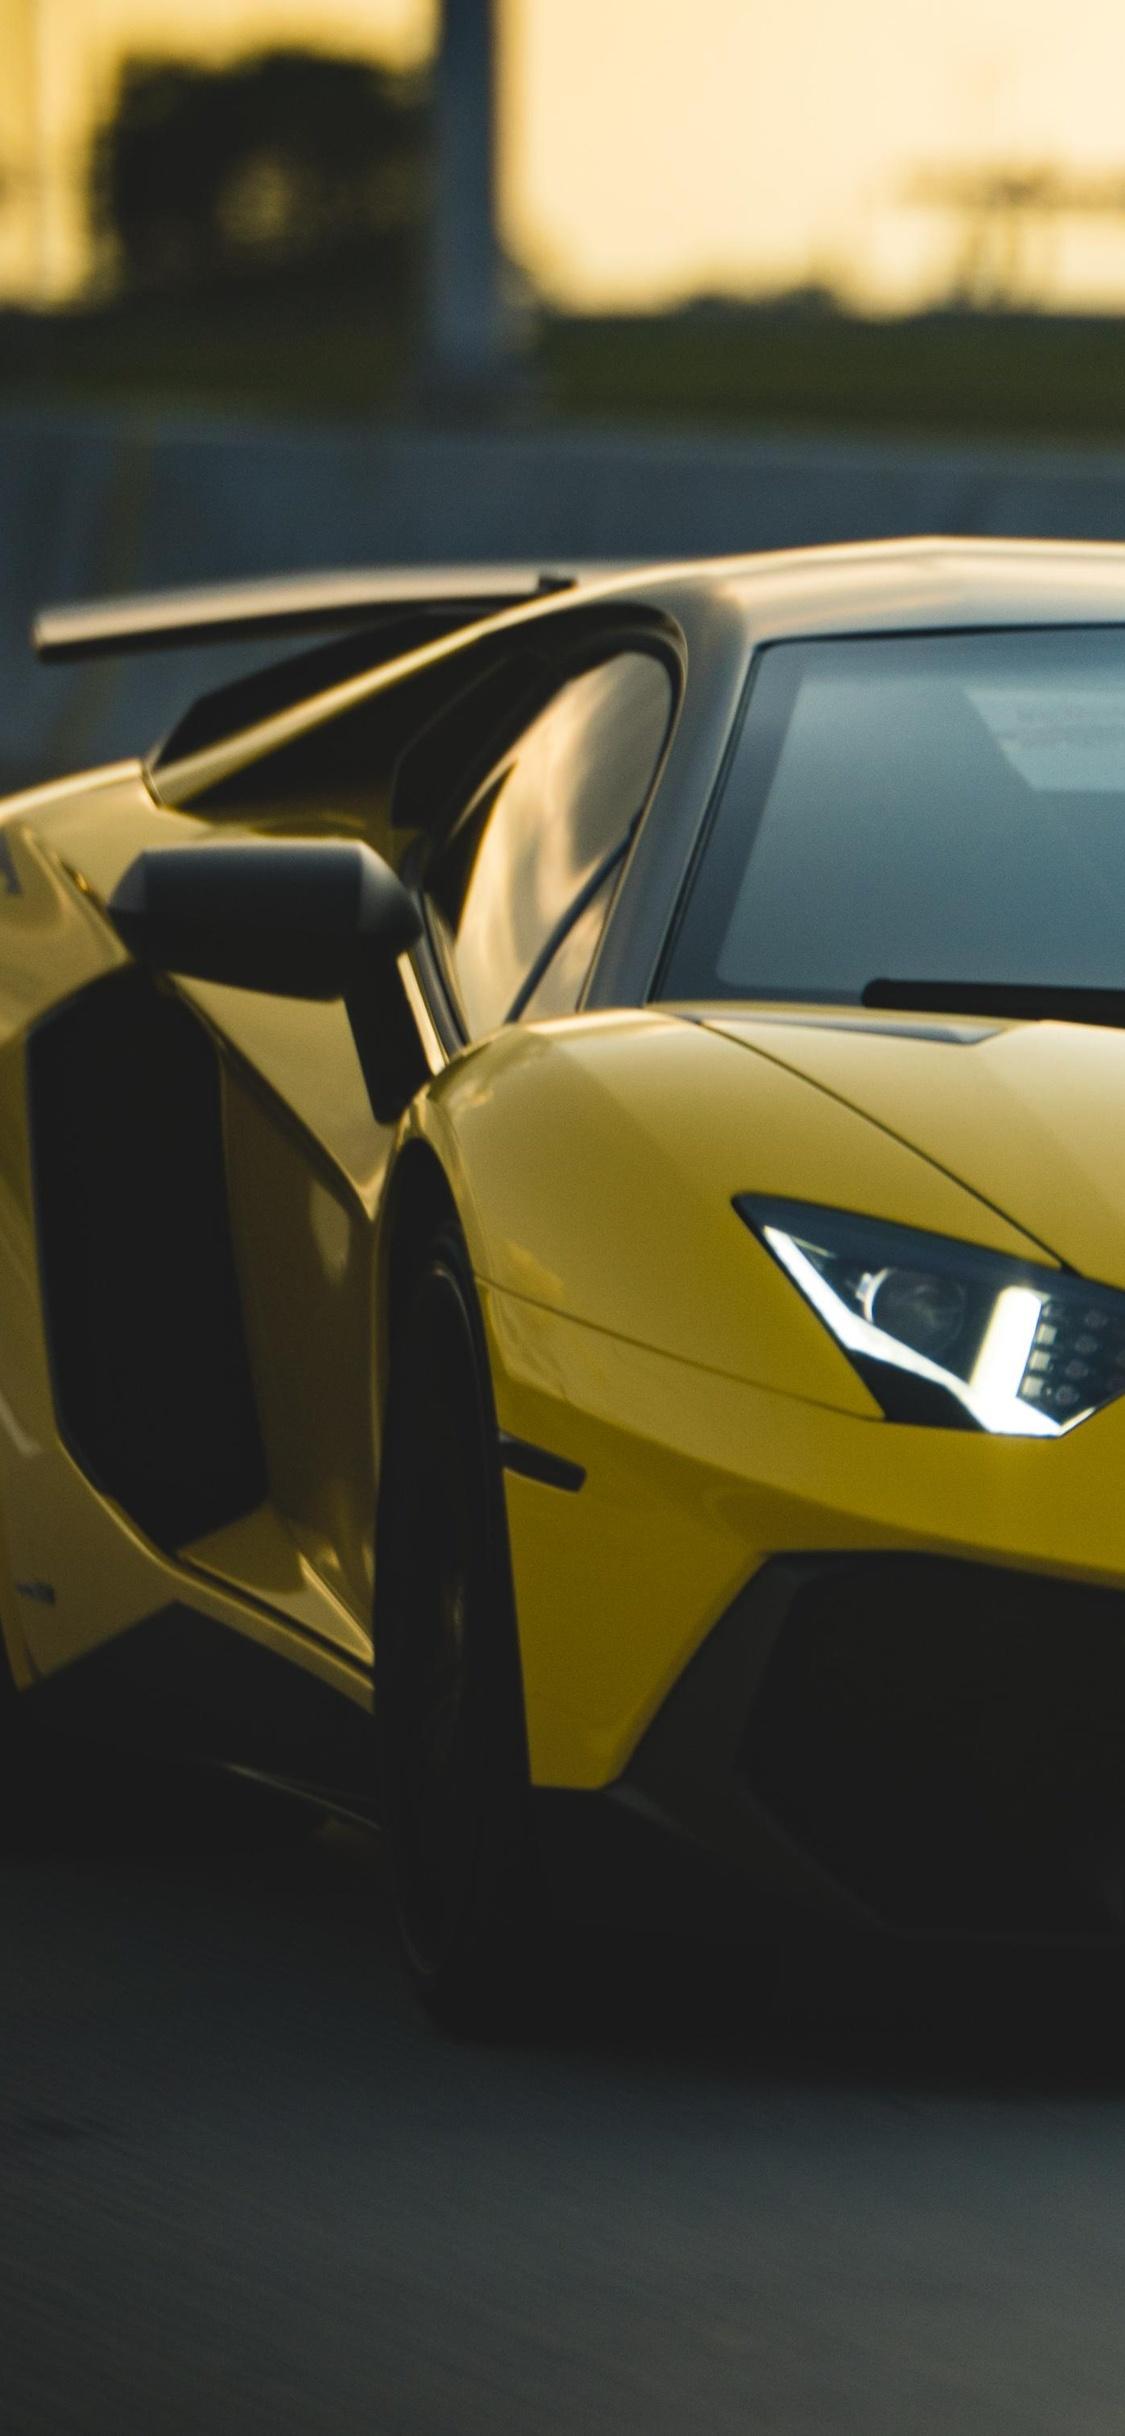 1125x2436 Lamborghini Aventador Sv 2018 Iphone Xs Iphone 10